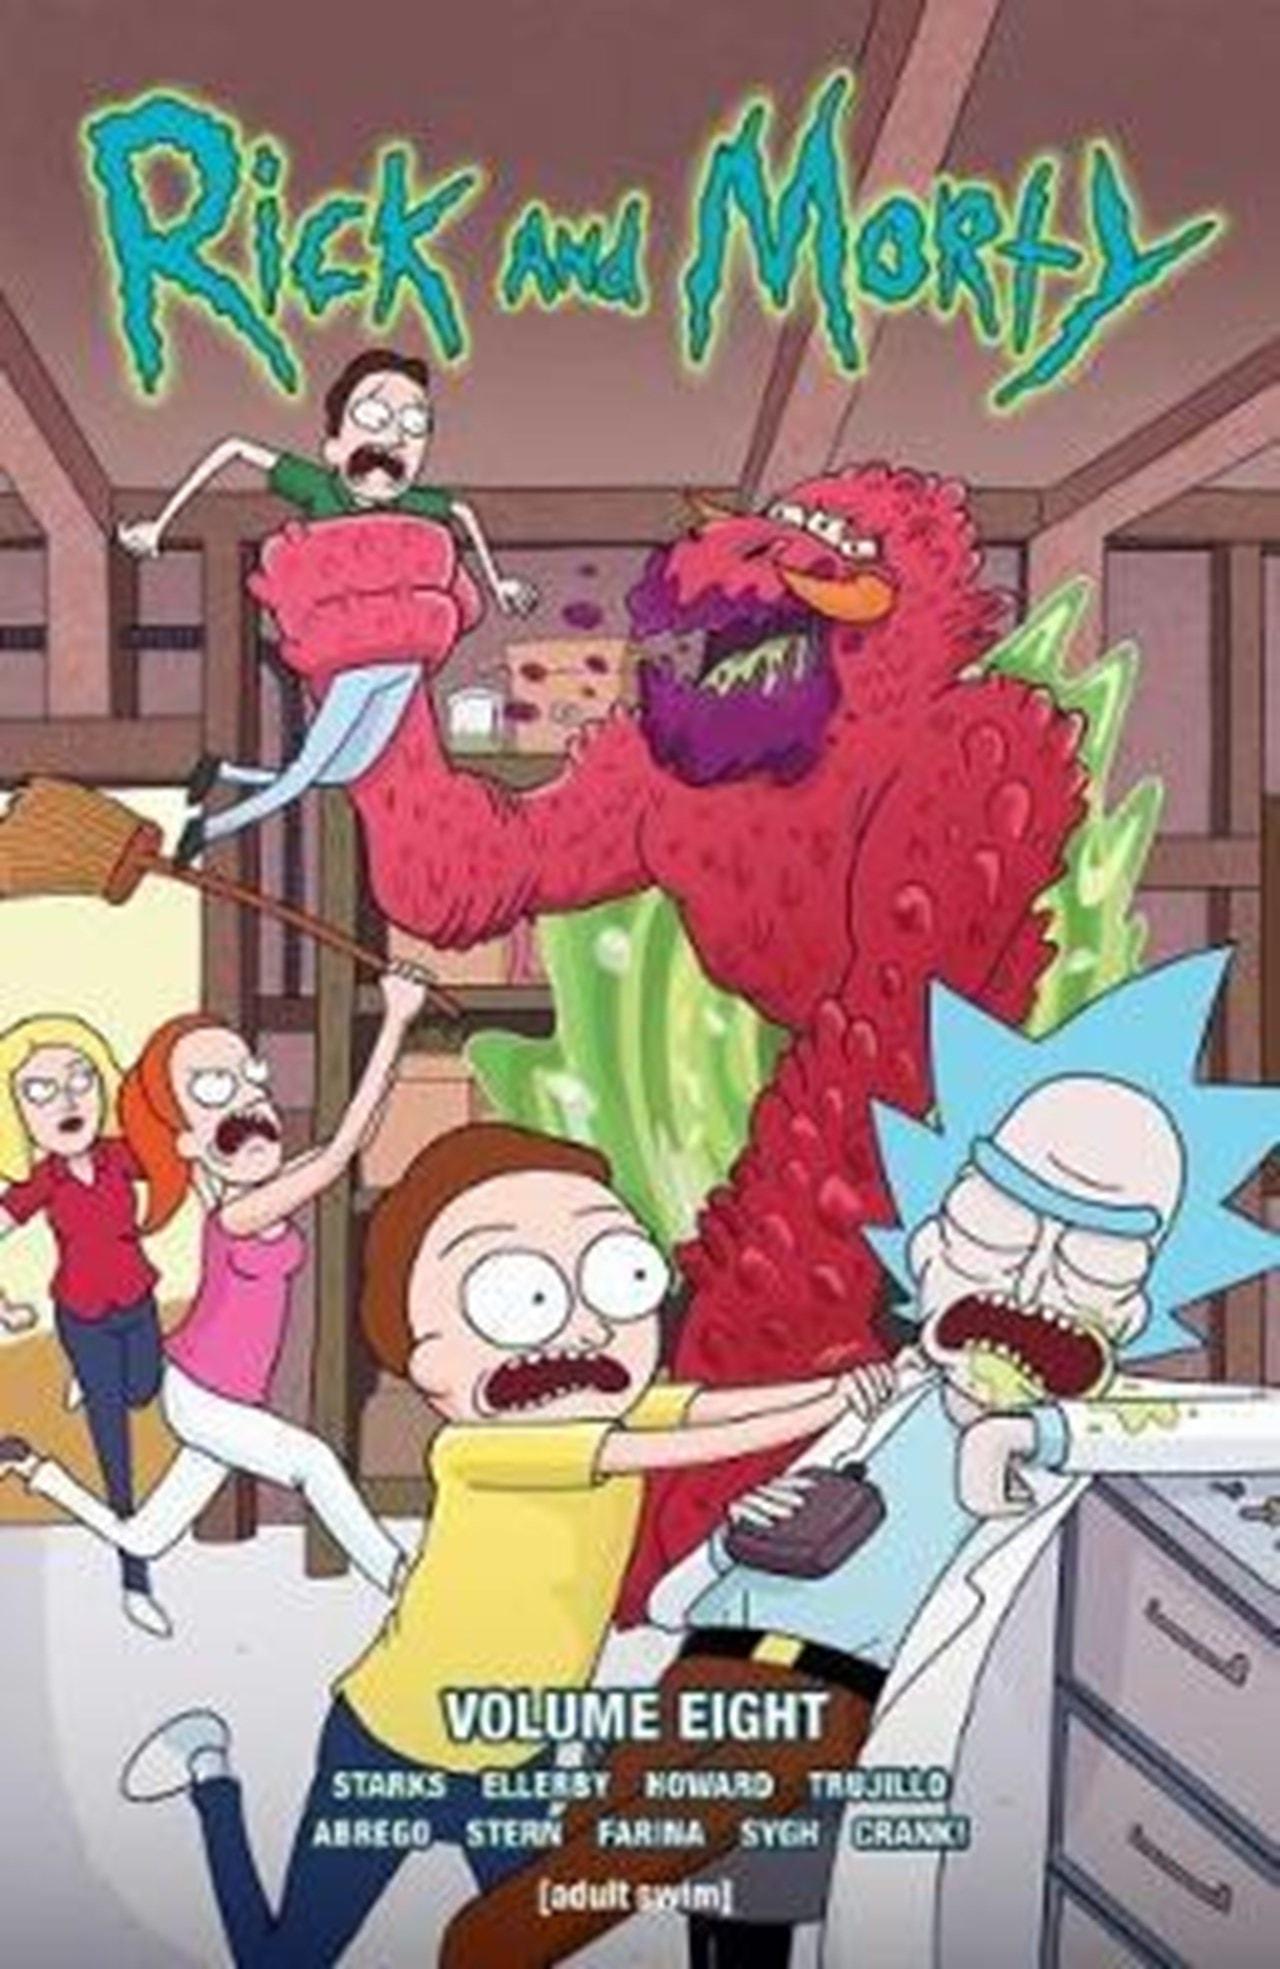 Rick & Morty Volume 8 - 1